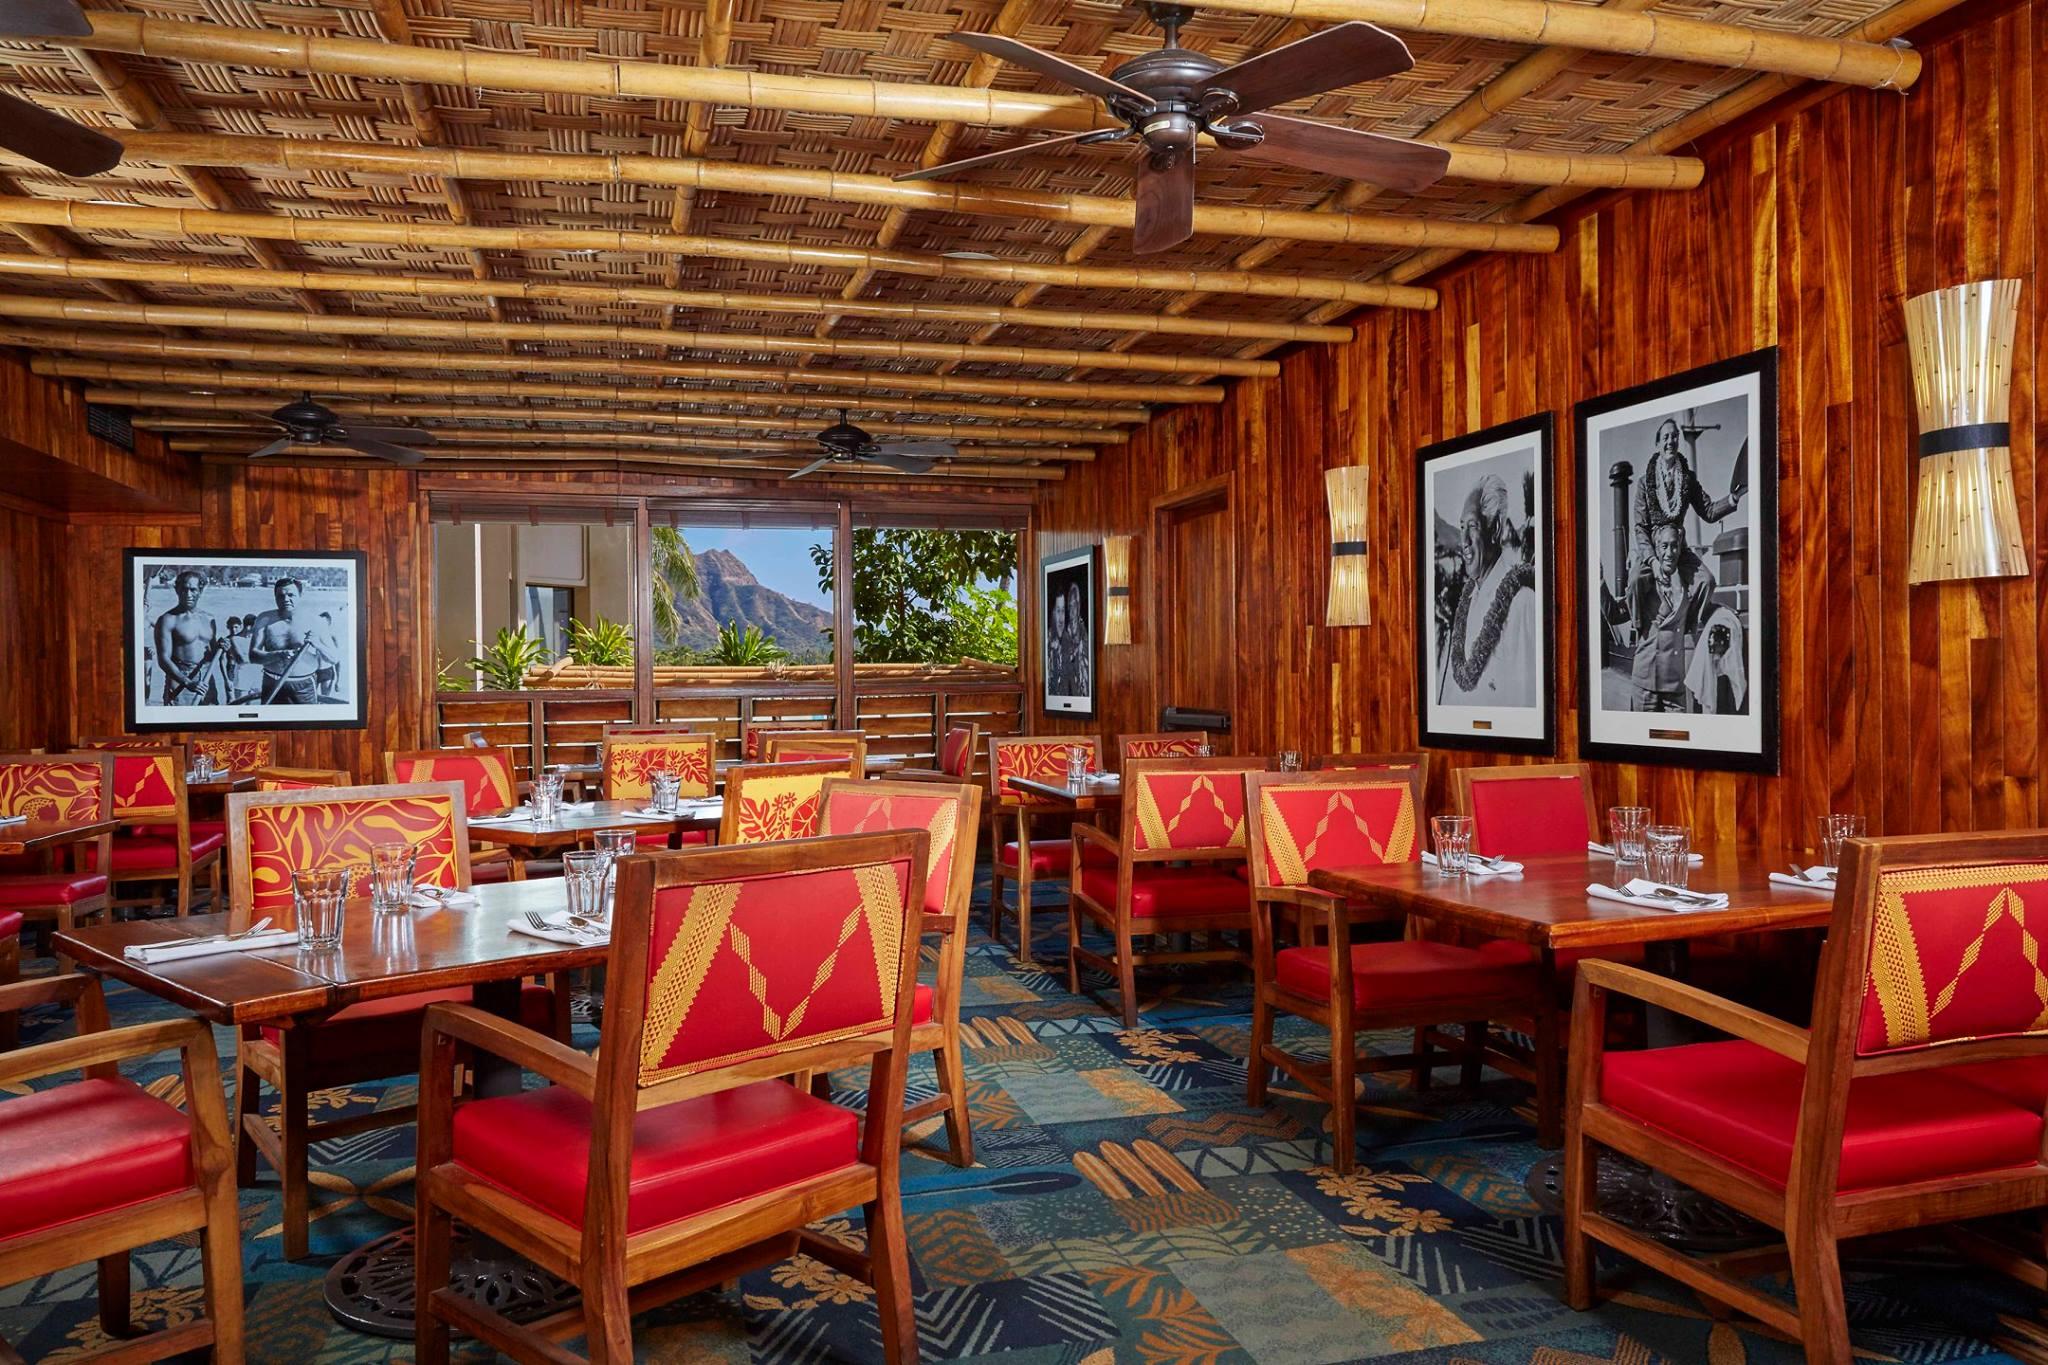 Duke's Private Dining